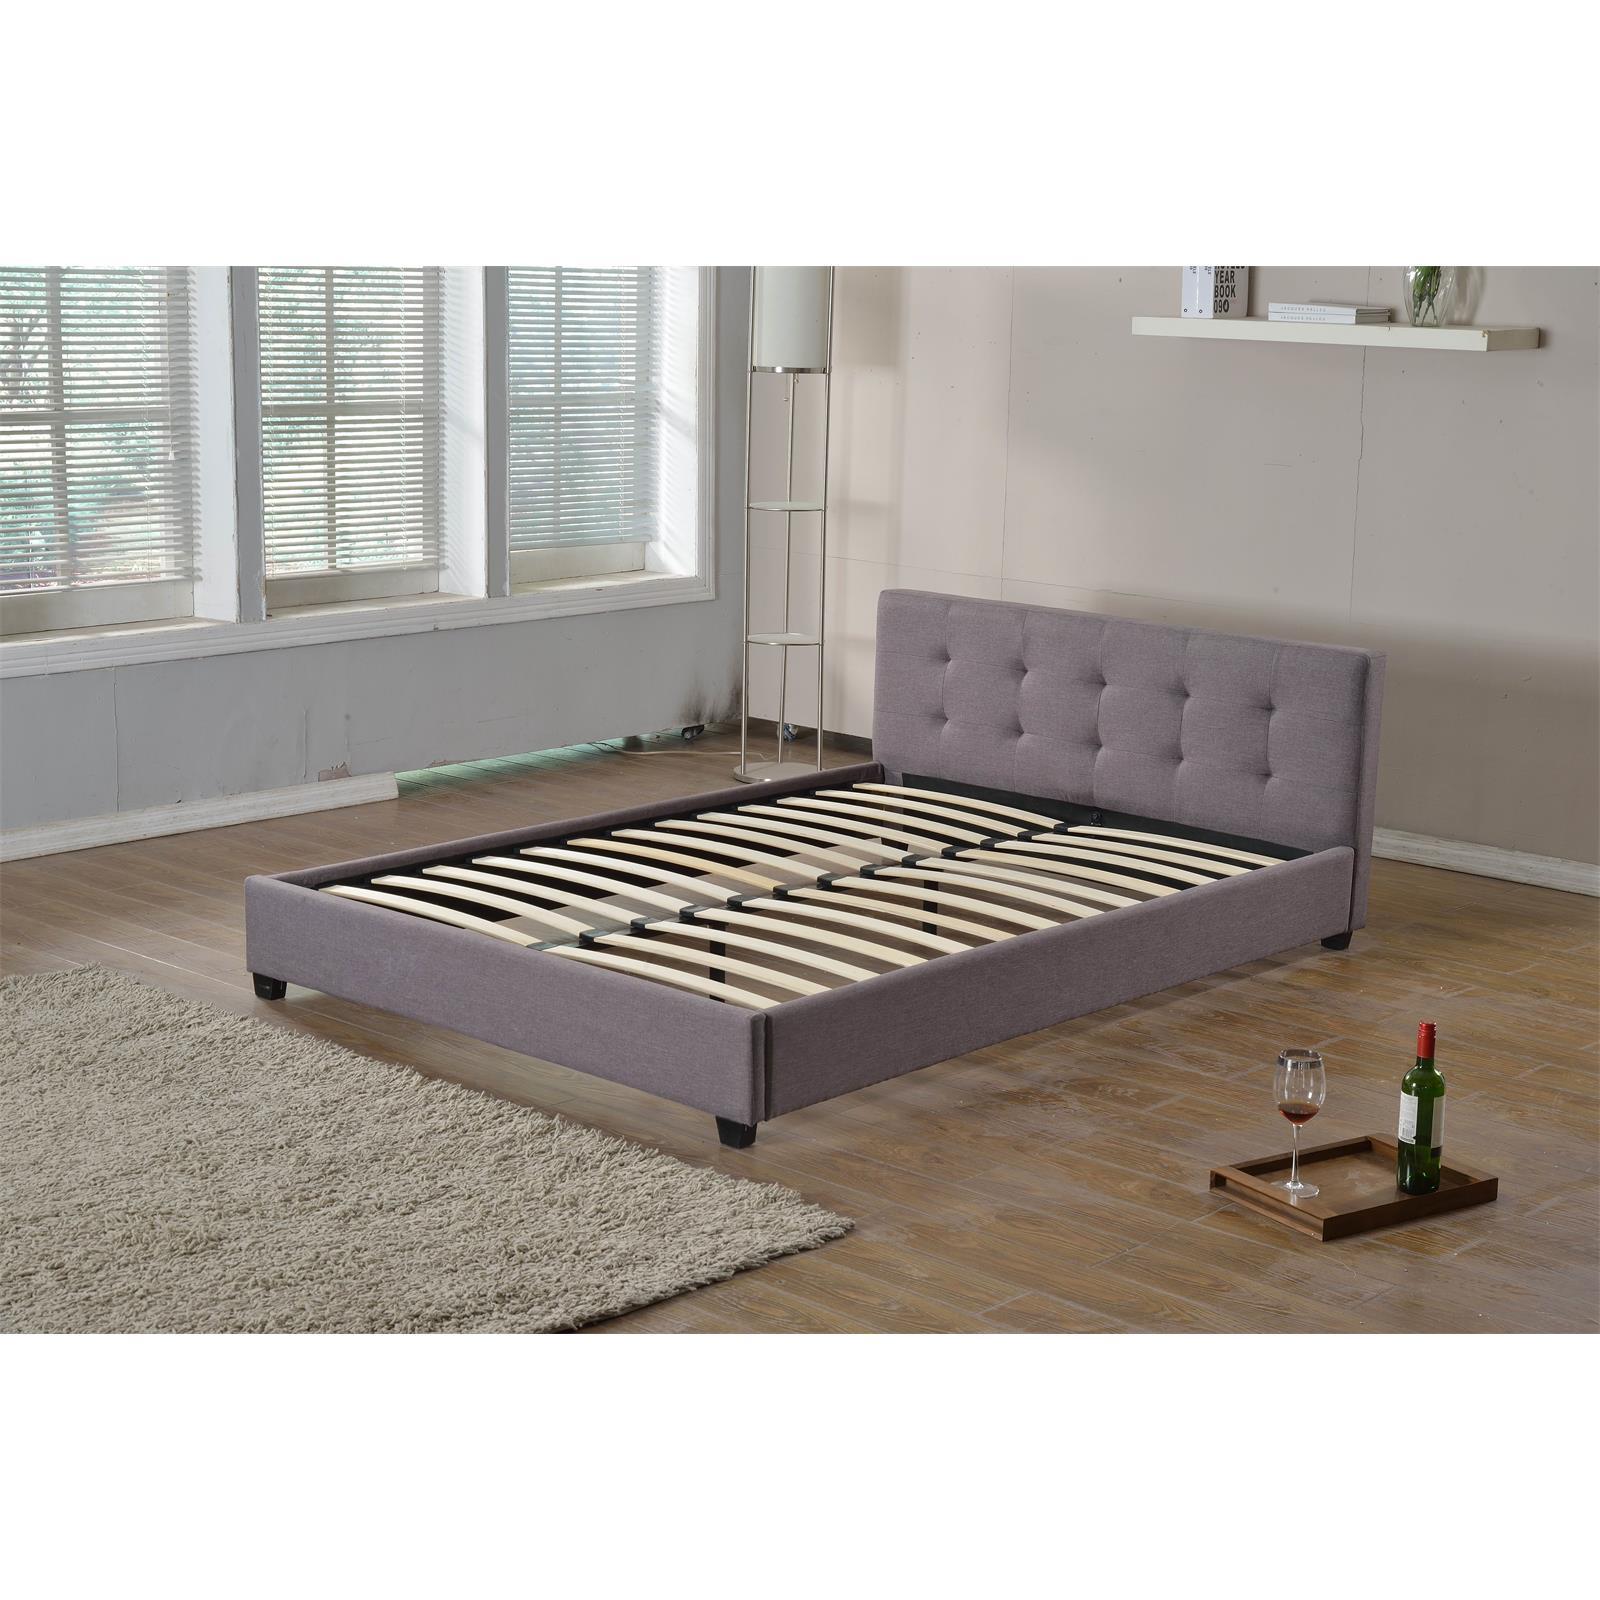 polsterbett doppelbett 140x200 mit rollrost stoffbezug grau o schwarz gestell ebay. Black Bedroom Furniture Sets. Home Design Ideas